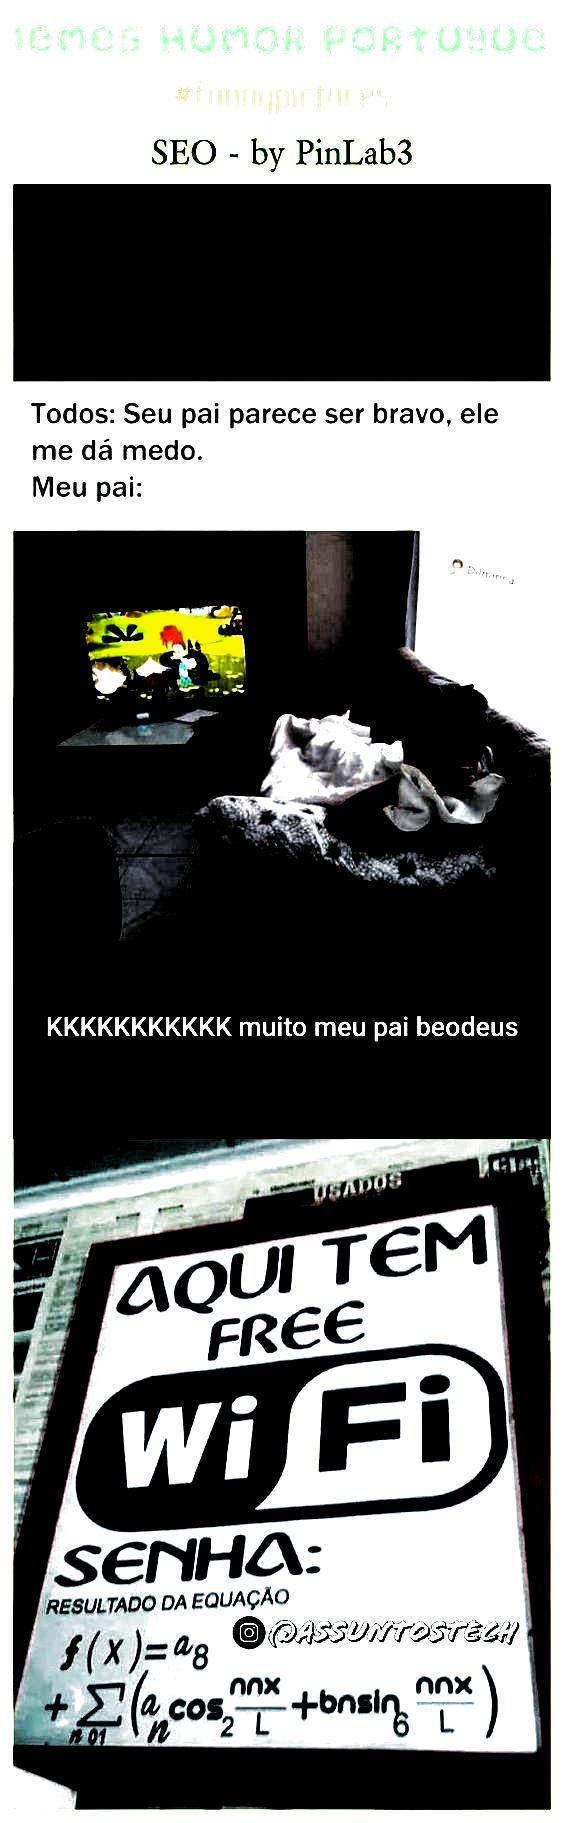 Memes humor portugues memes humor portugues - memes humour portugues - memes humor portugues - memes humor